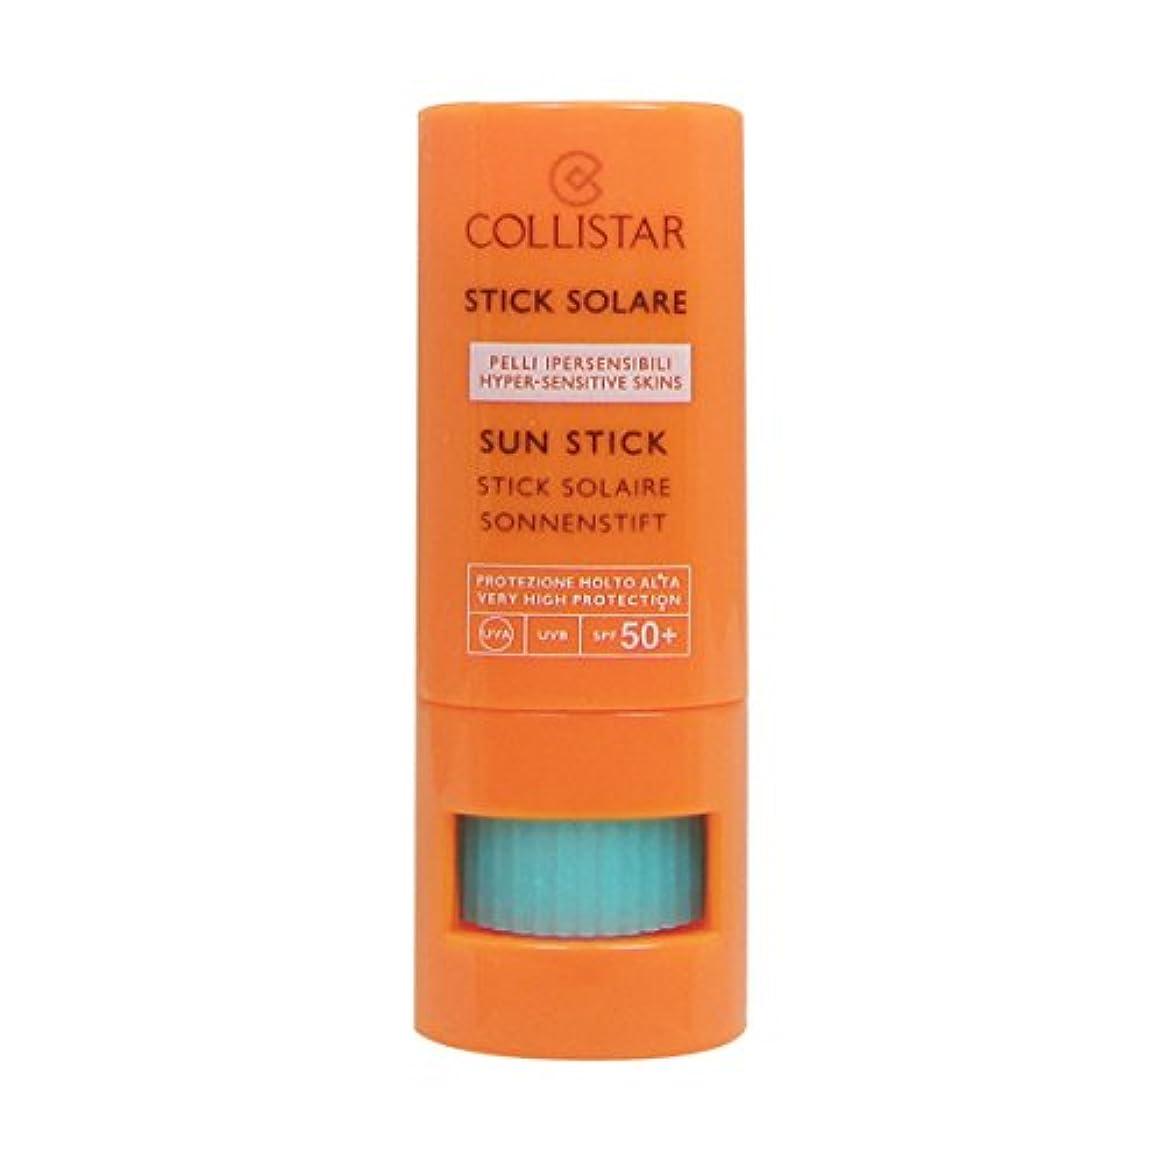 バルブ司法突撃Collistar Sun Stick Spf50+ 8ml [並行輸入品]